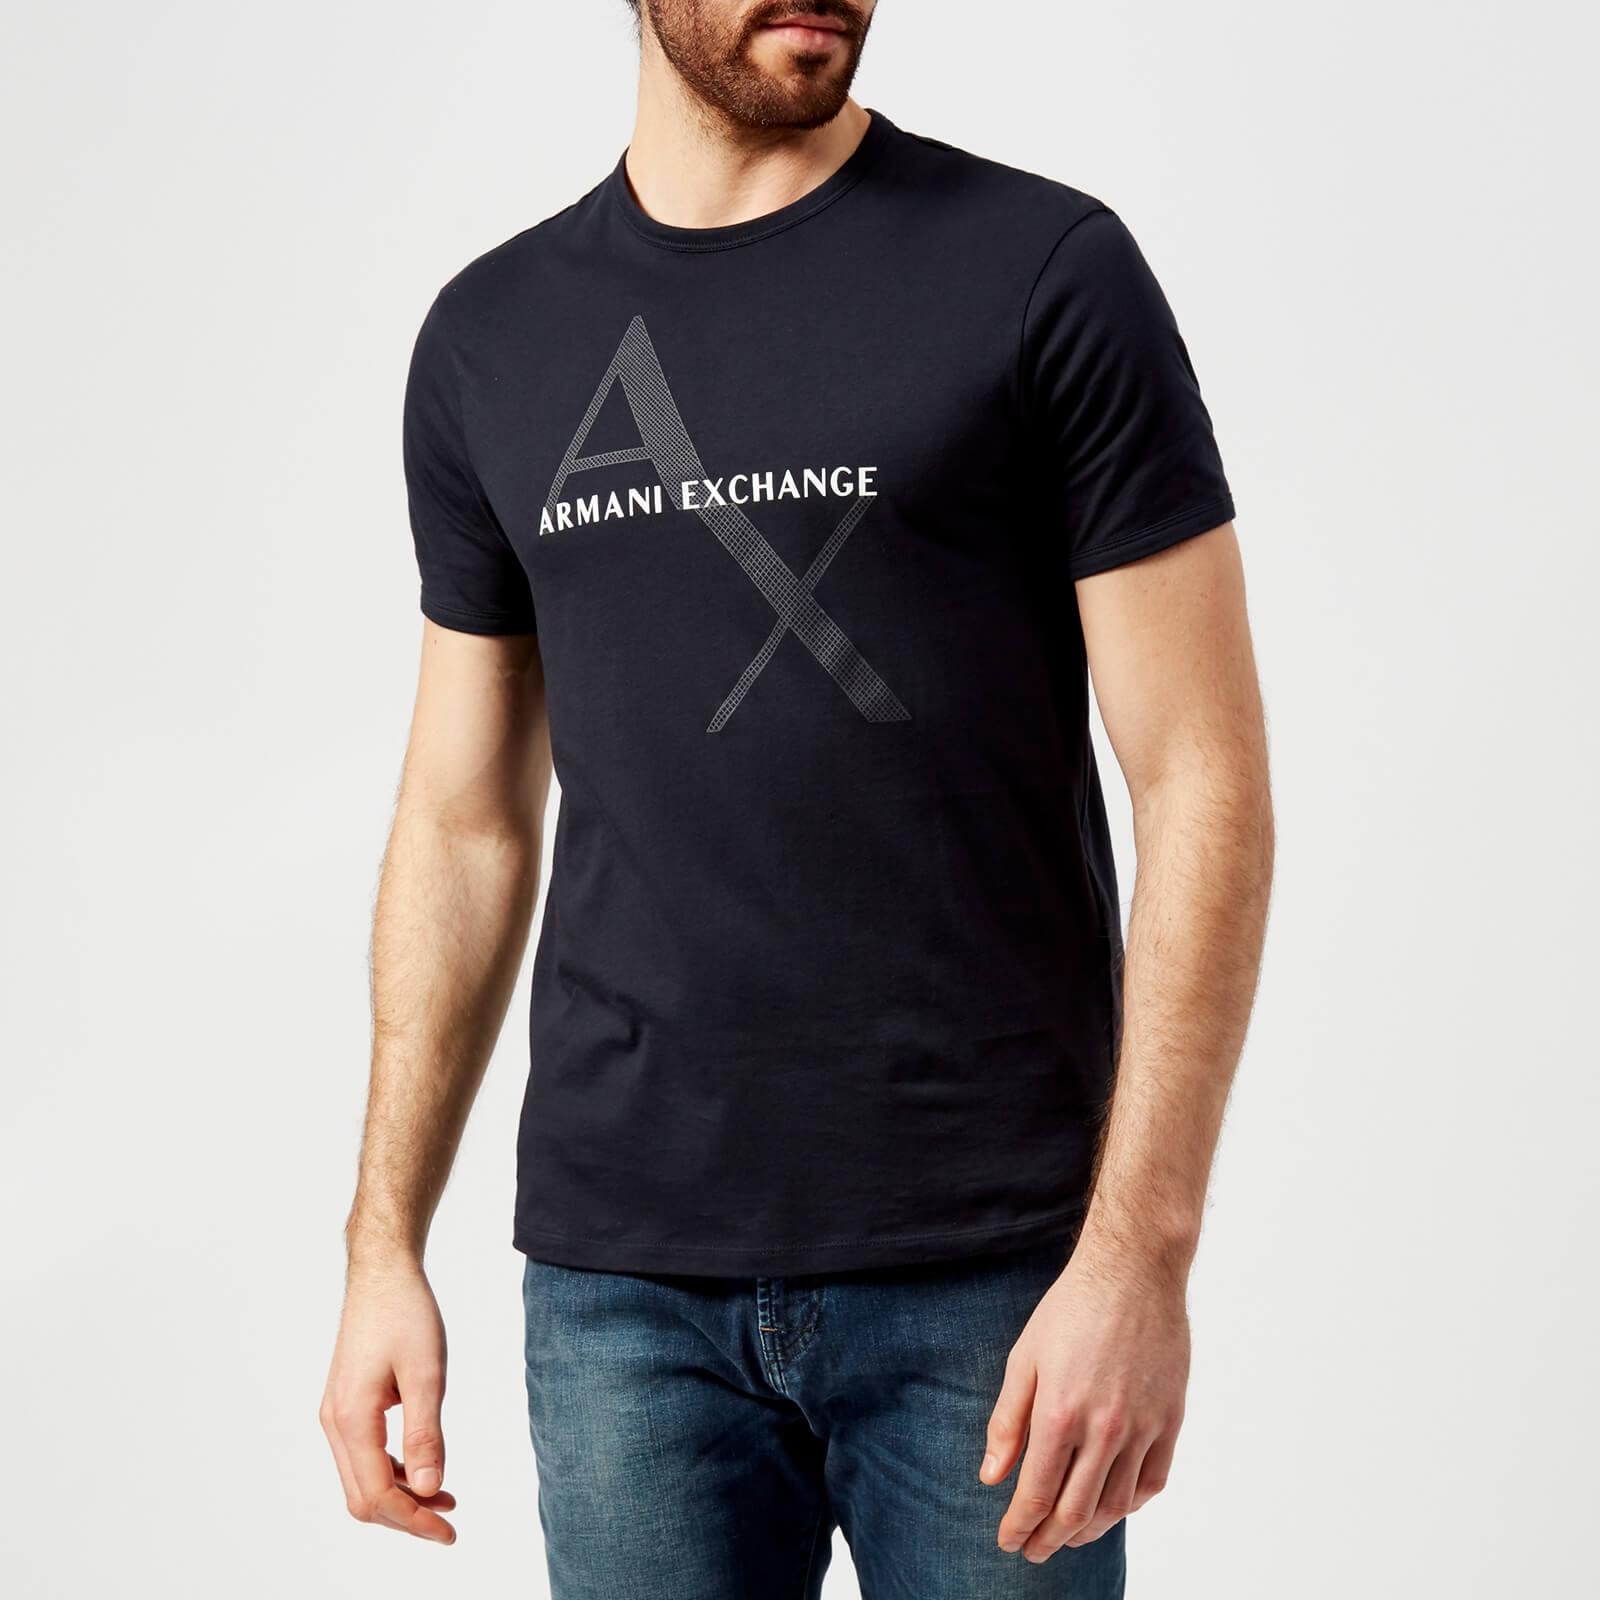 3d443504617 Armani Exchange Men s Script Logo T-Shirt - Navy Clothing